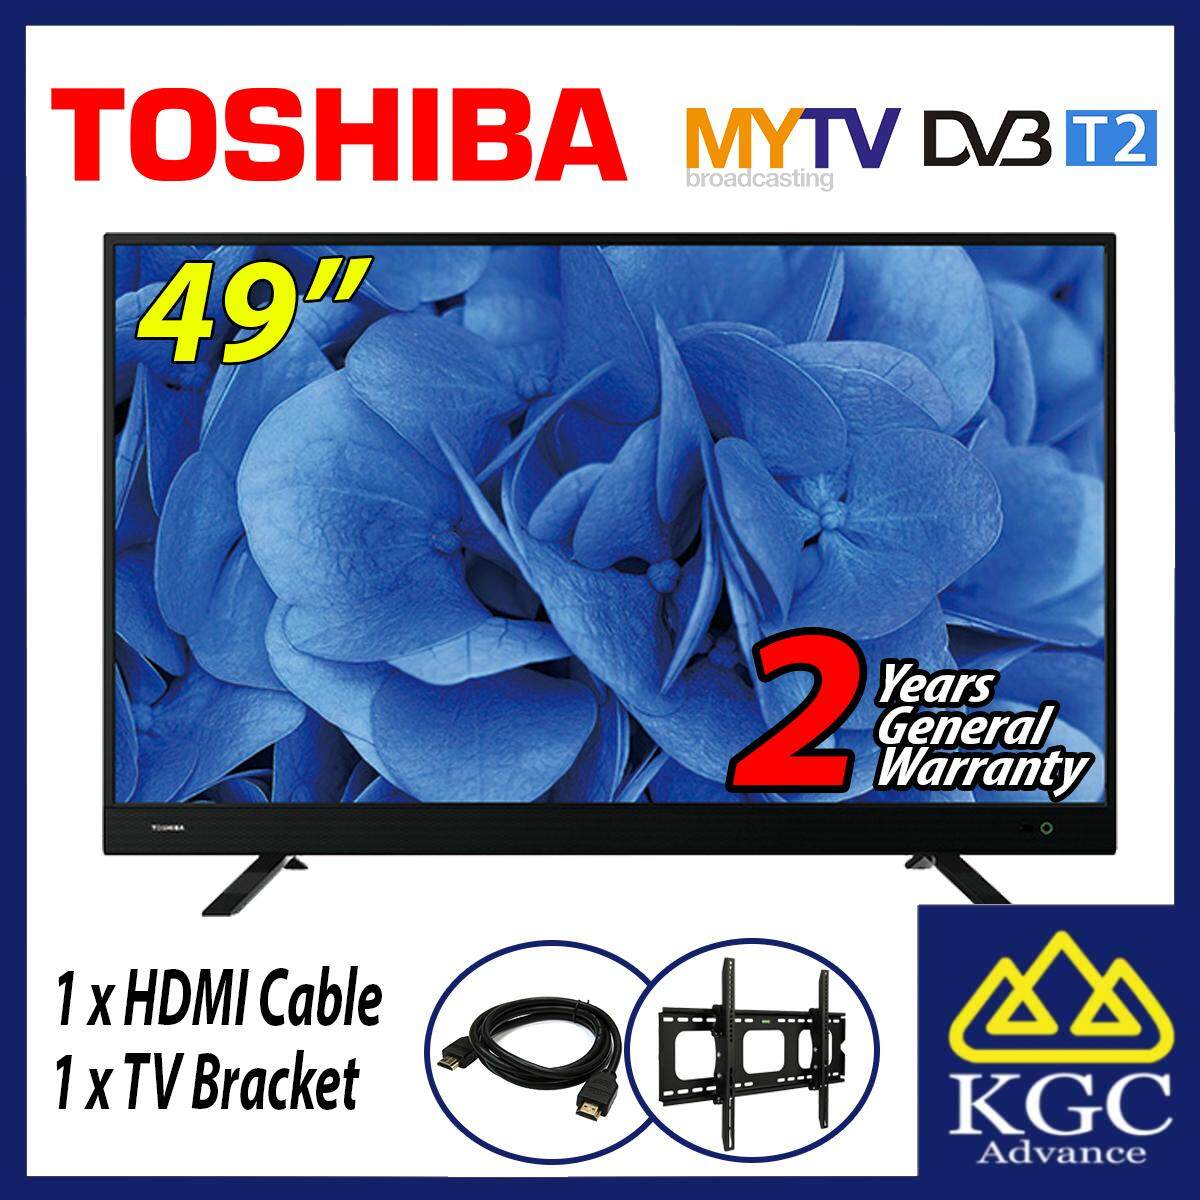 Toshiba 49 inch DVBT2 Full HD LED TV 49L3750VM (Free TV Bracket & HDMI Cable)